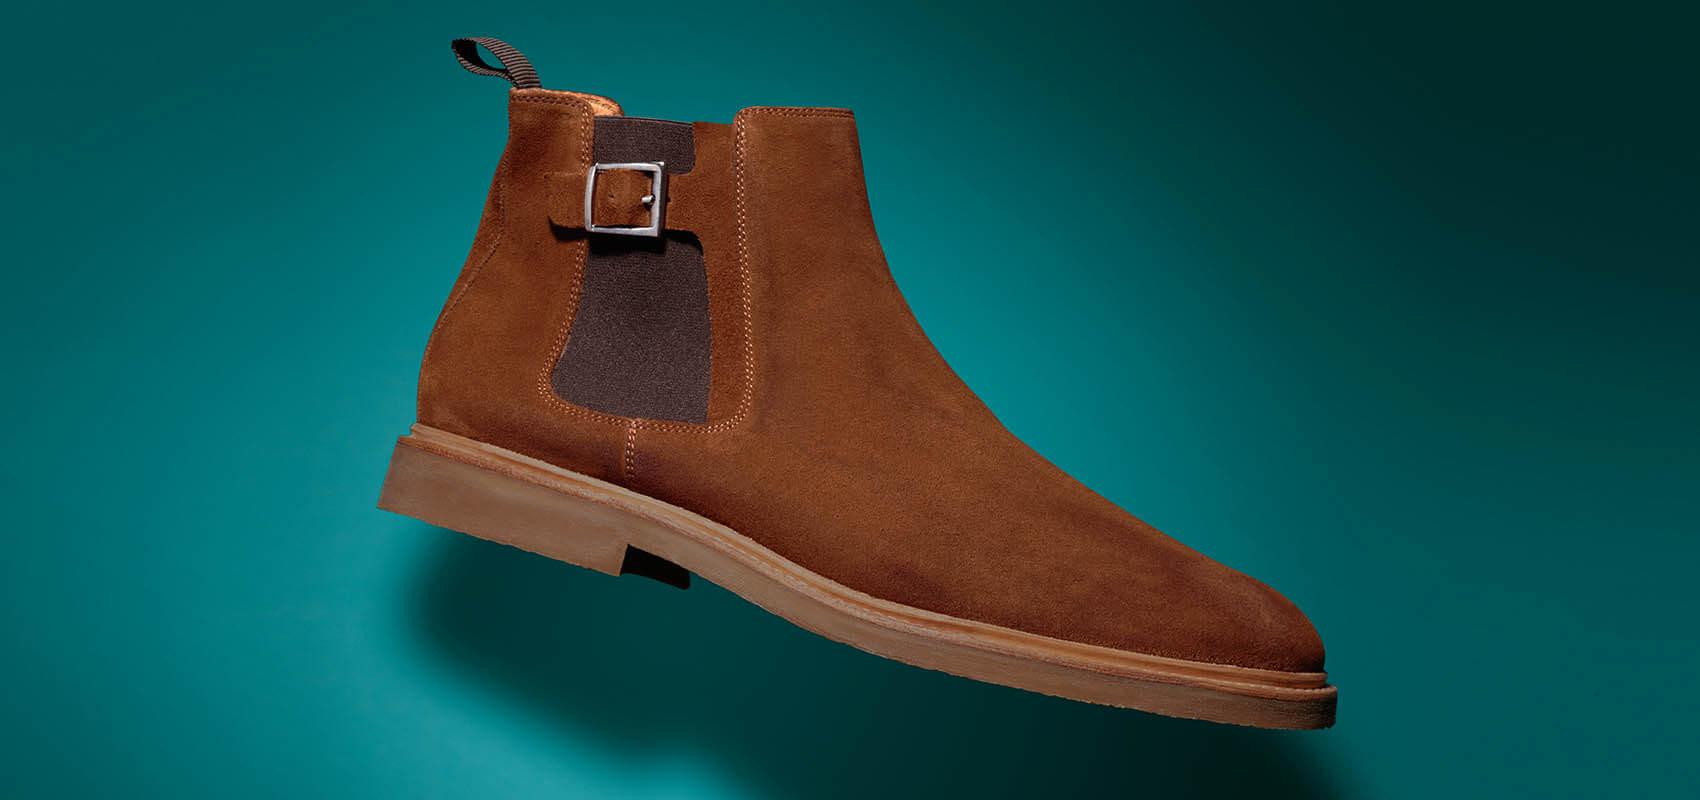 Charles Tyrwhitt Boots